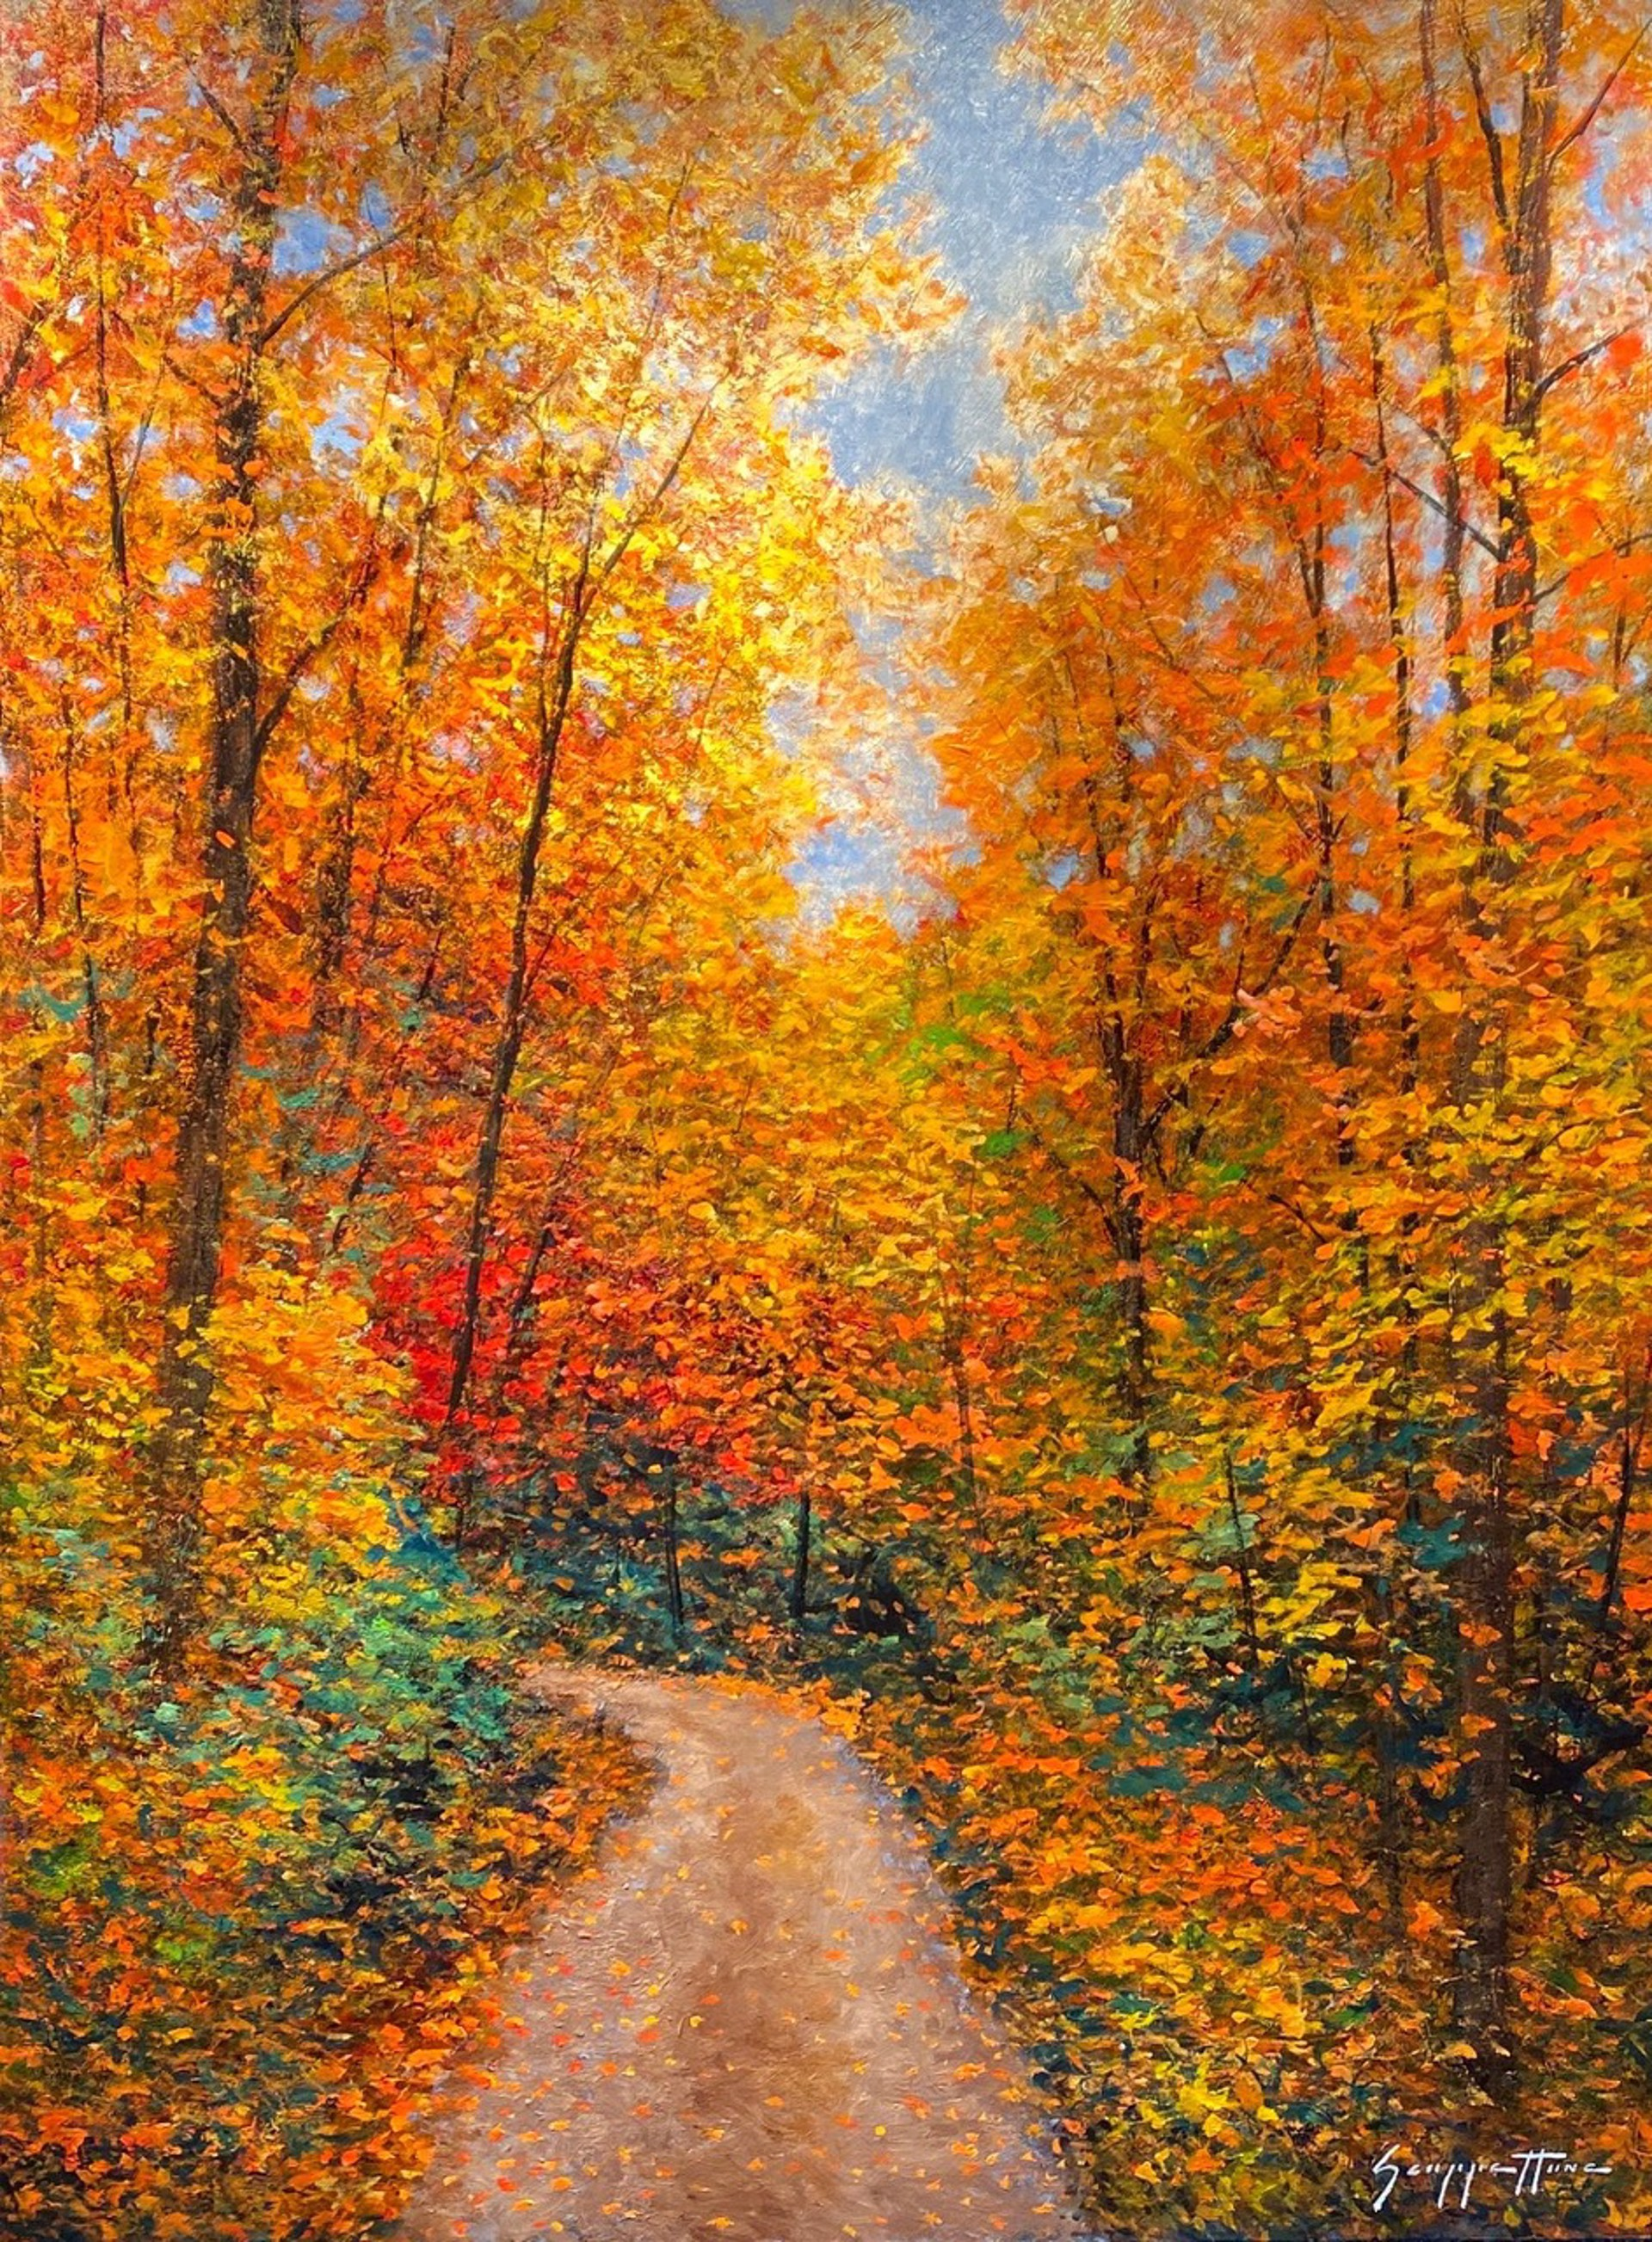 Celebration Lane, Autumn by James Scoppettone